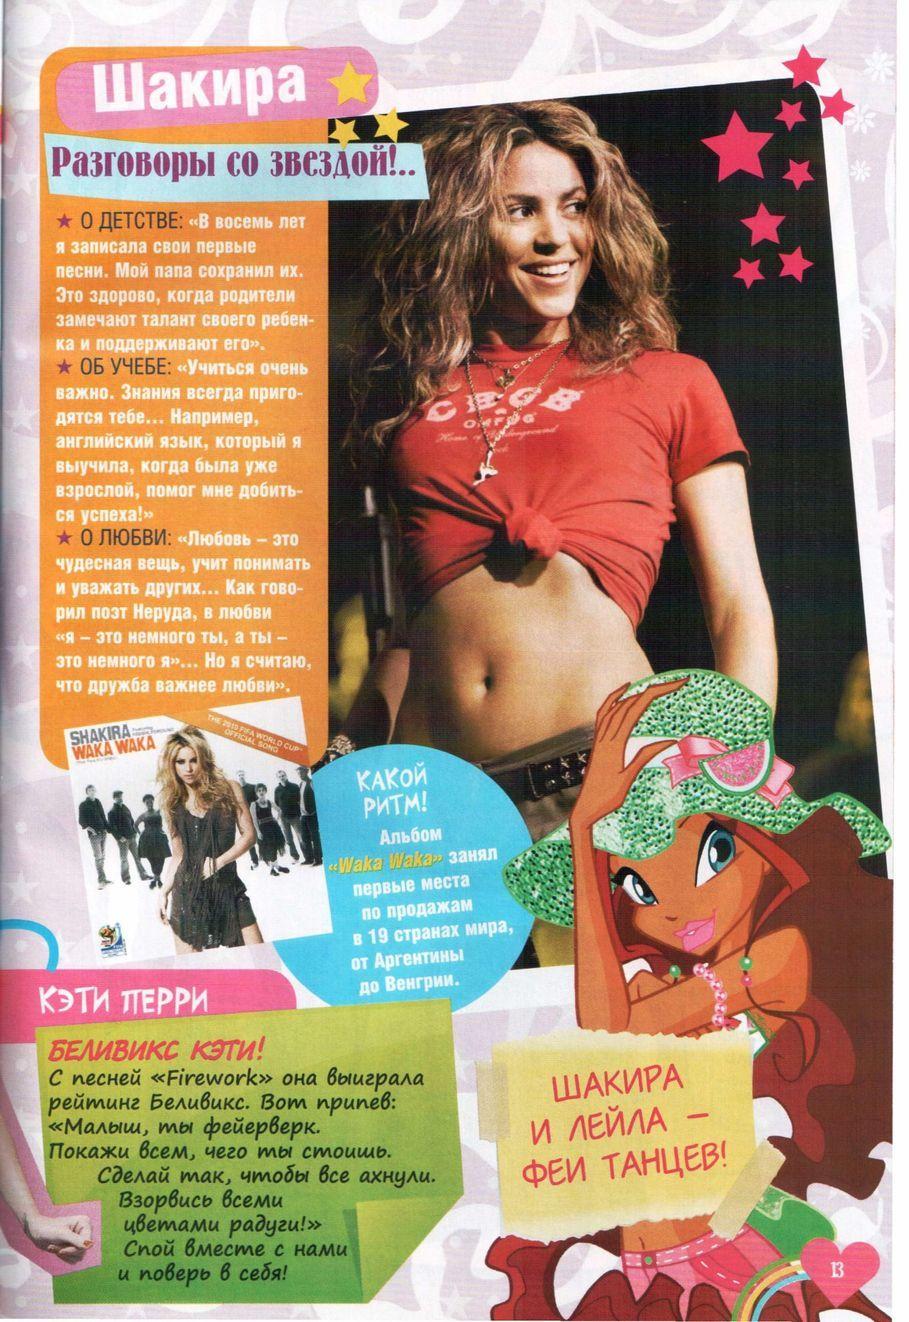 Комикс Винкс Winx - Опасный замысел (Журнал Винкс №10 2011) - стр. 13